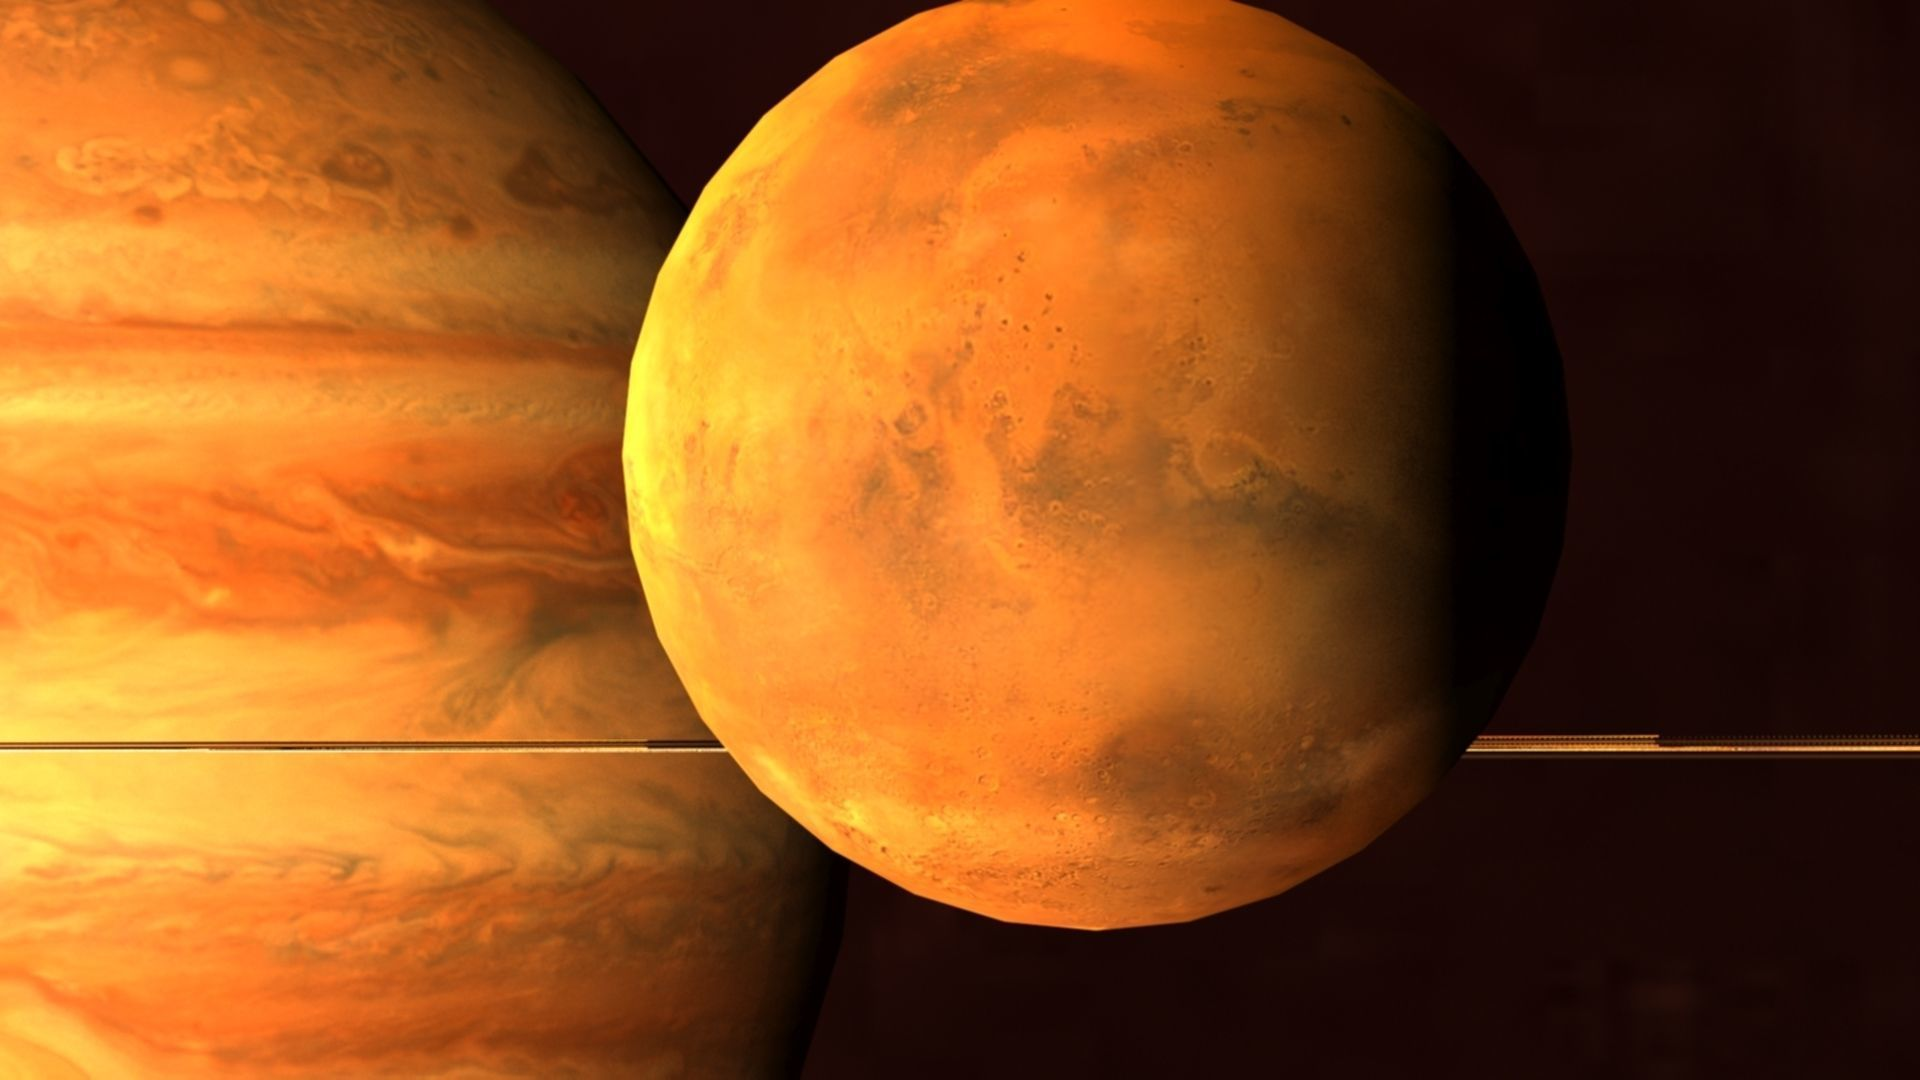 Solar System Scifi LowPoly